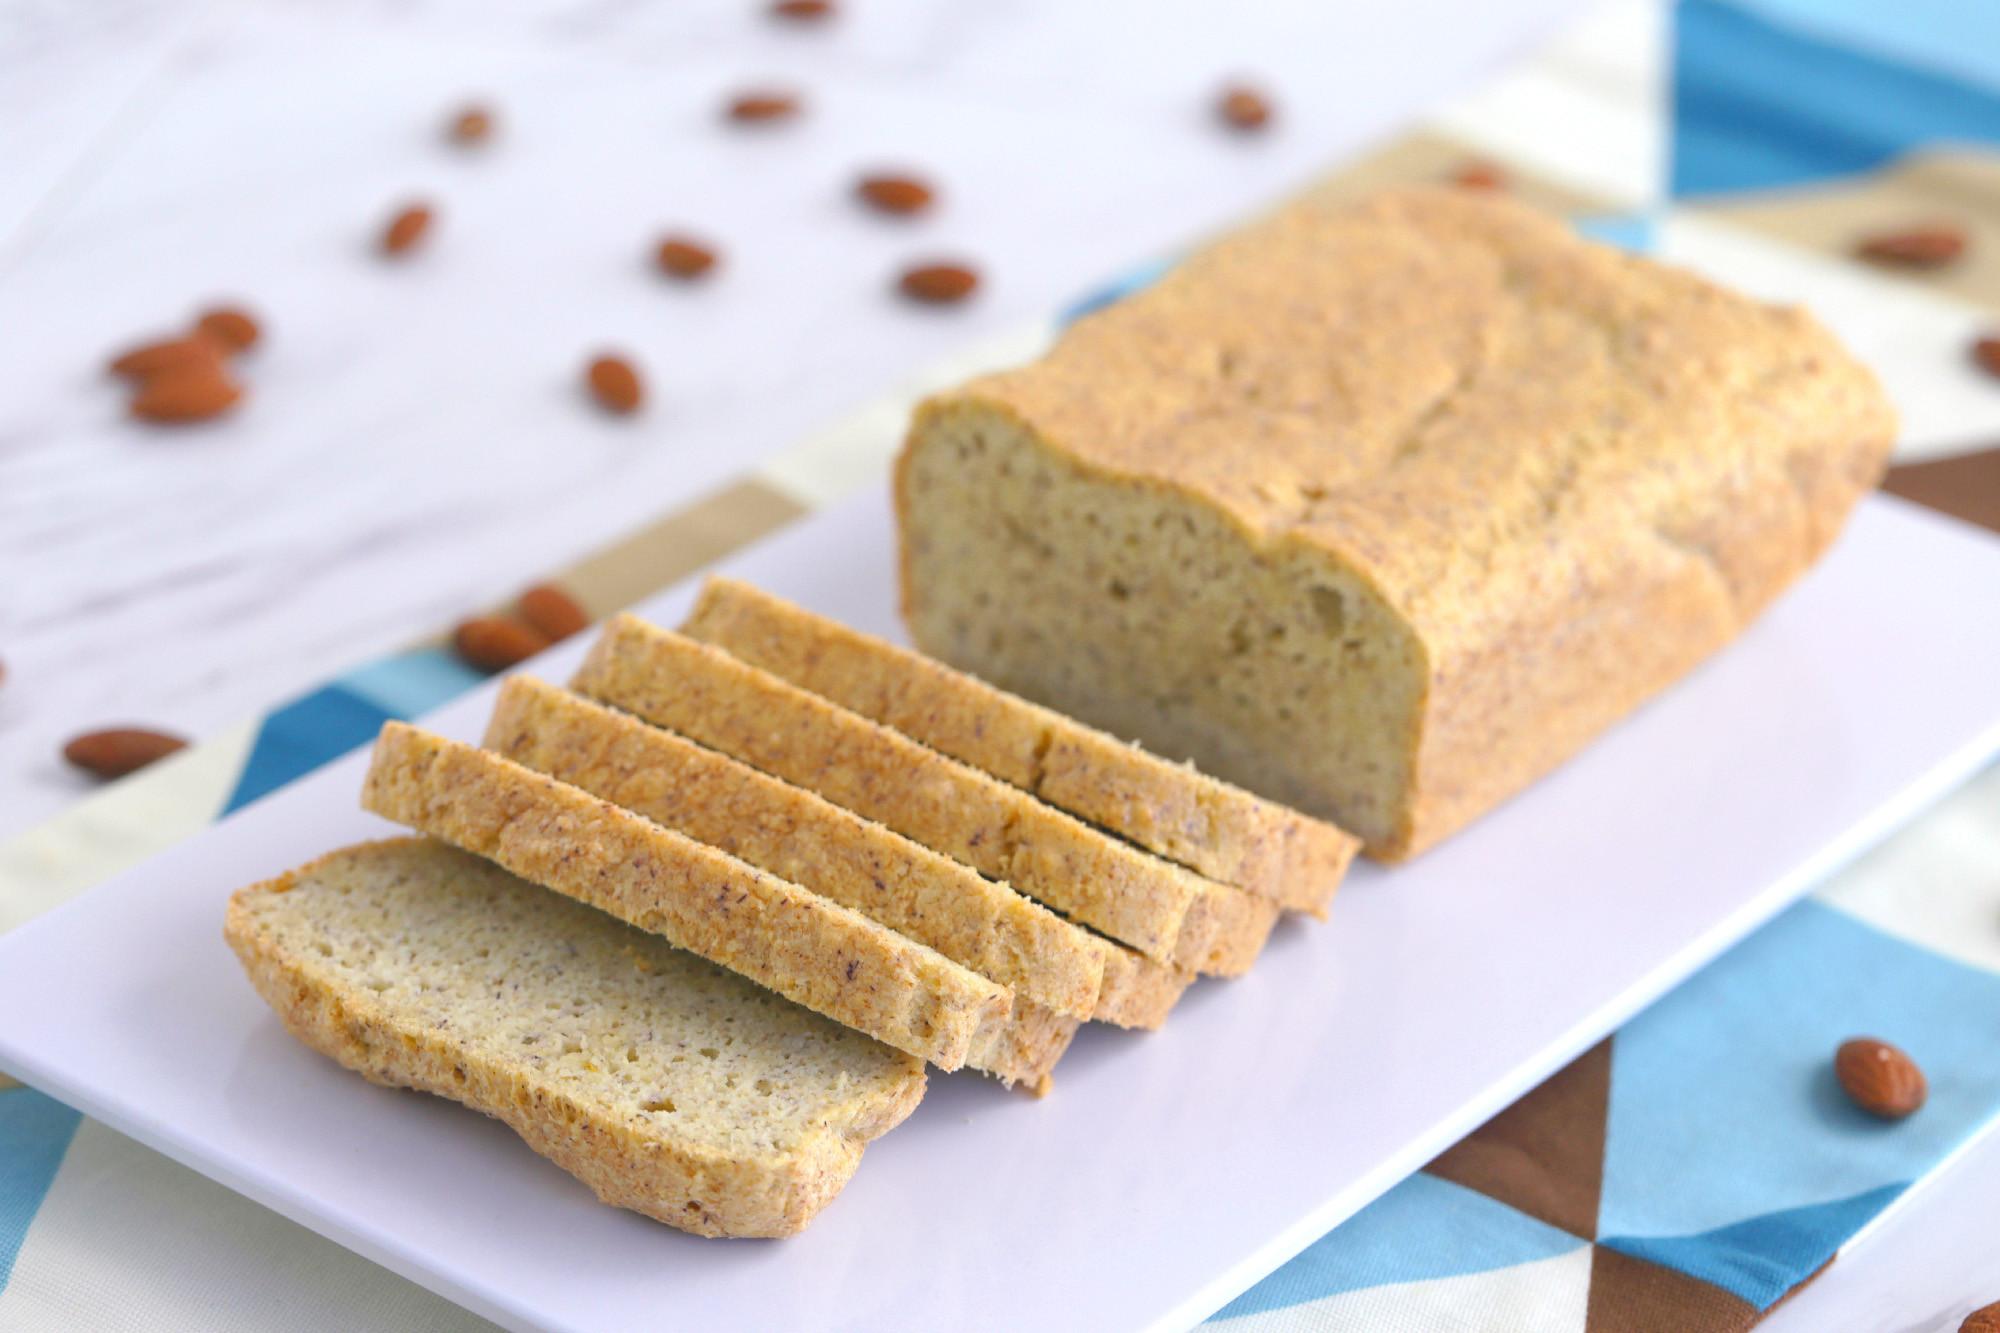 Low Carb Bread Recipes Almond Flour  Low Carb Almond Flour Bread Recipe